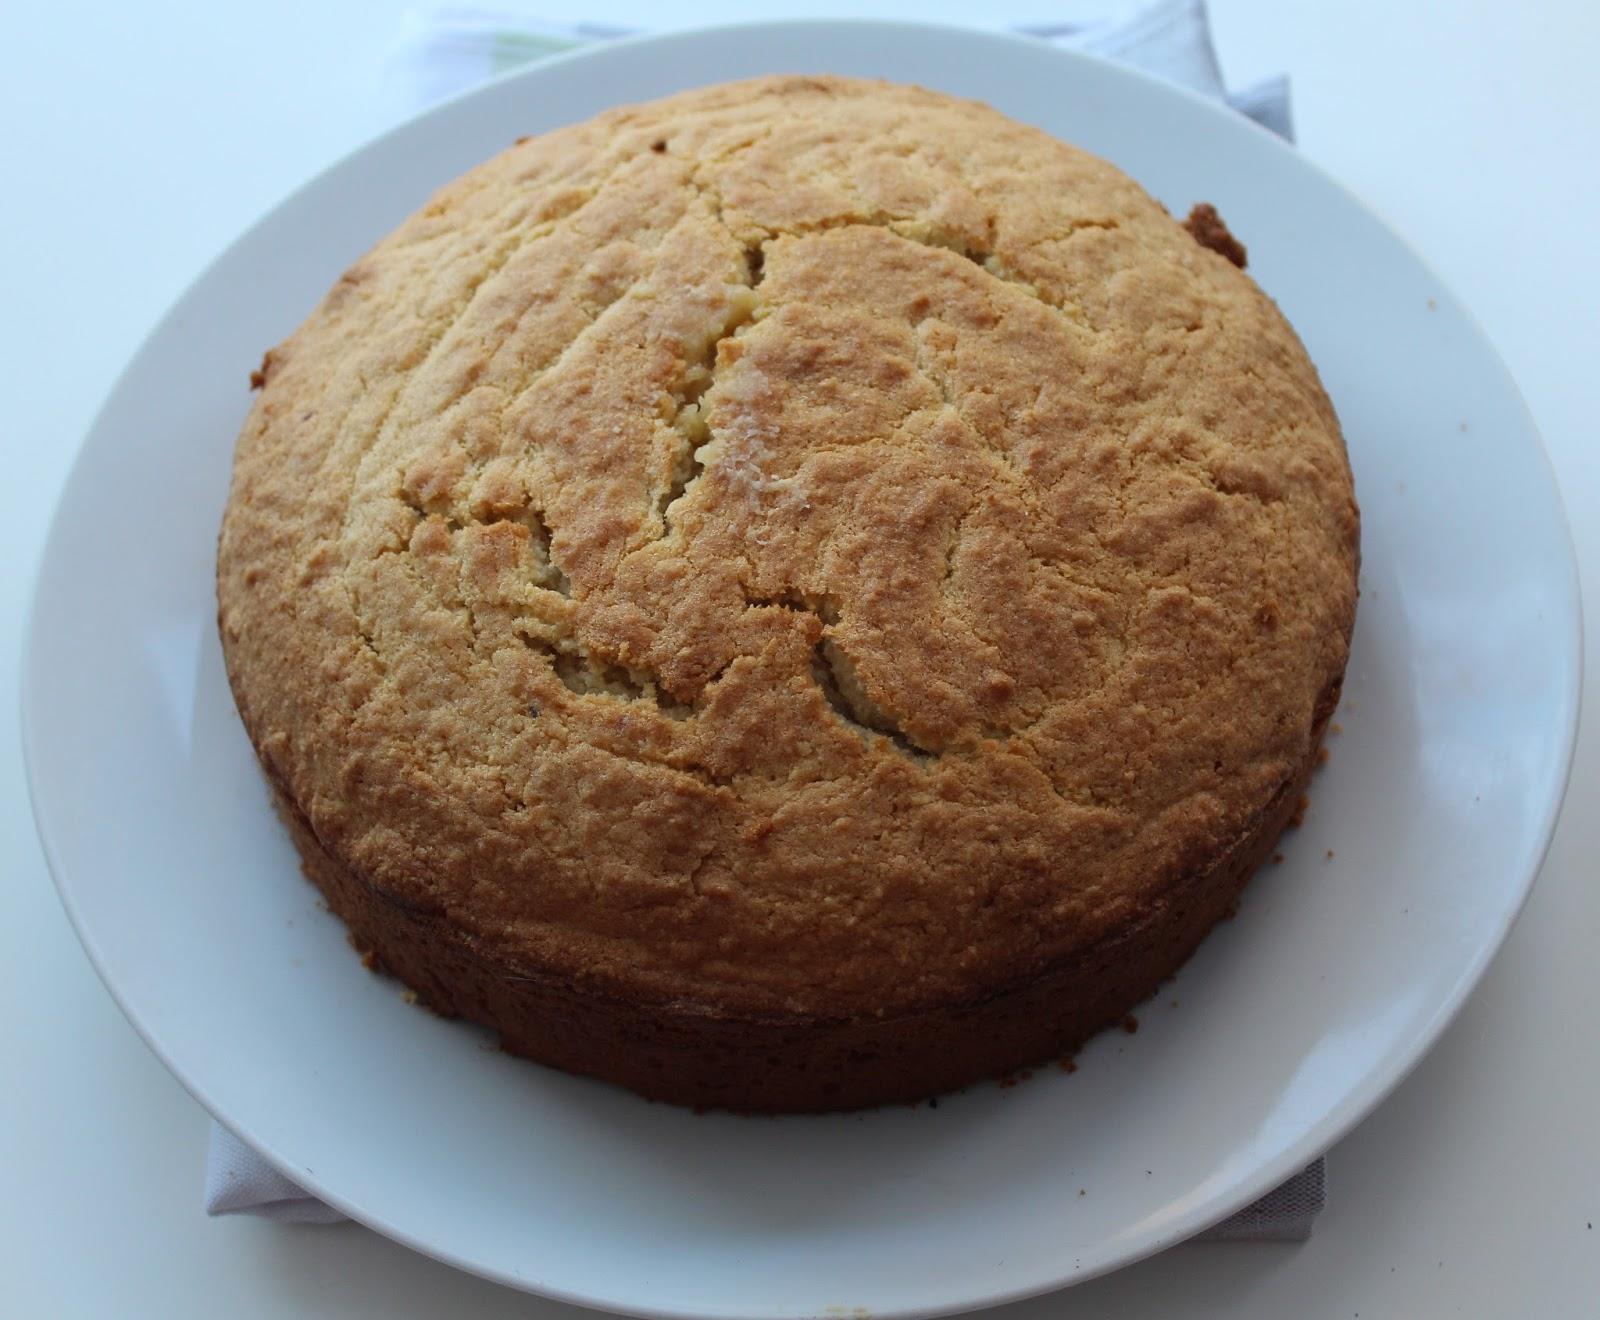 Hazelnut Cake Recipes Uk: Beck Valley Books & More: Paprika Goulash Recipe And For